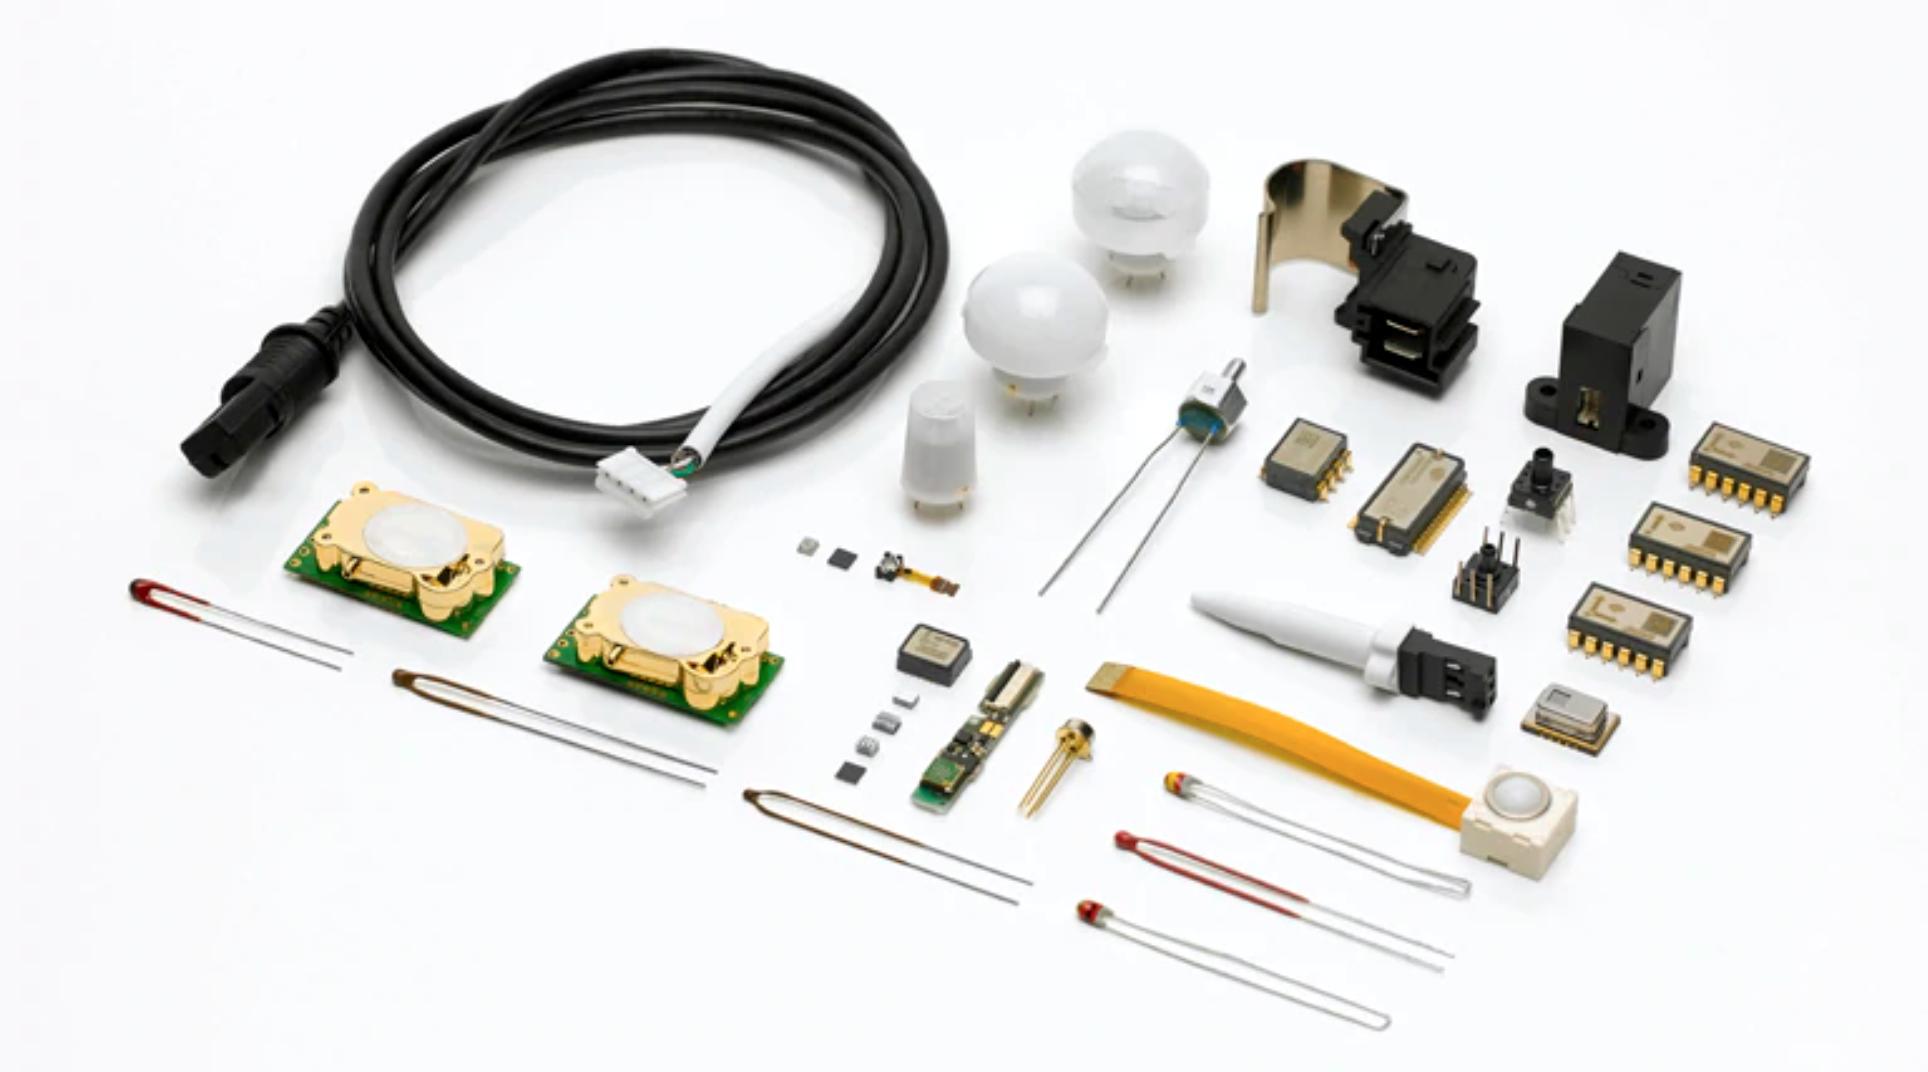 sensor technologies are key to the IoT